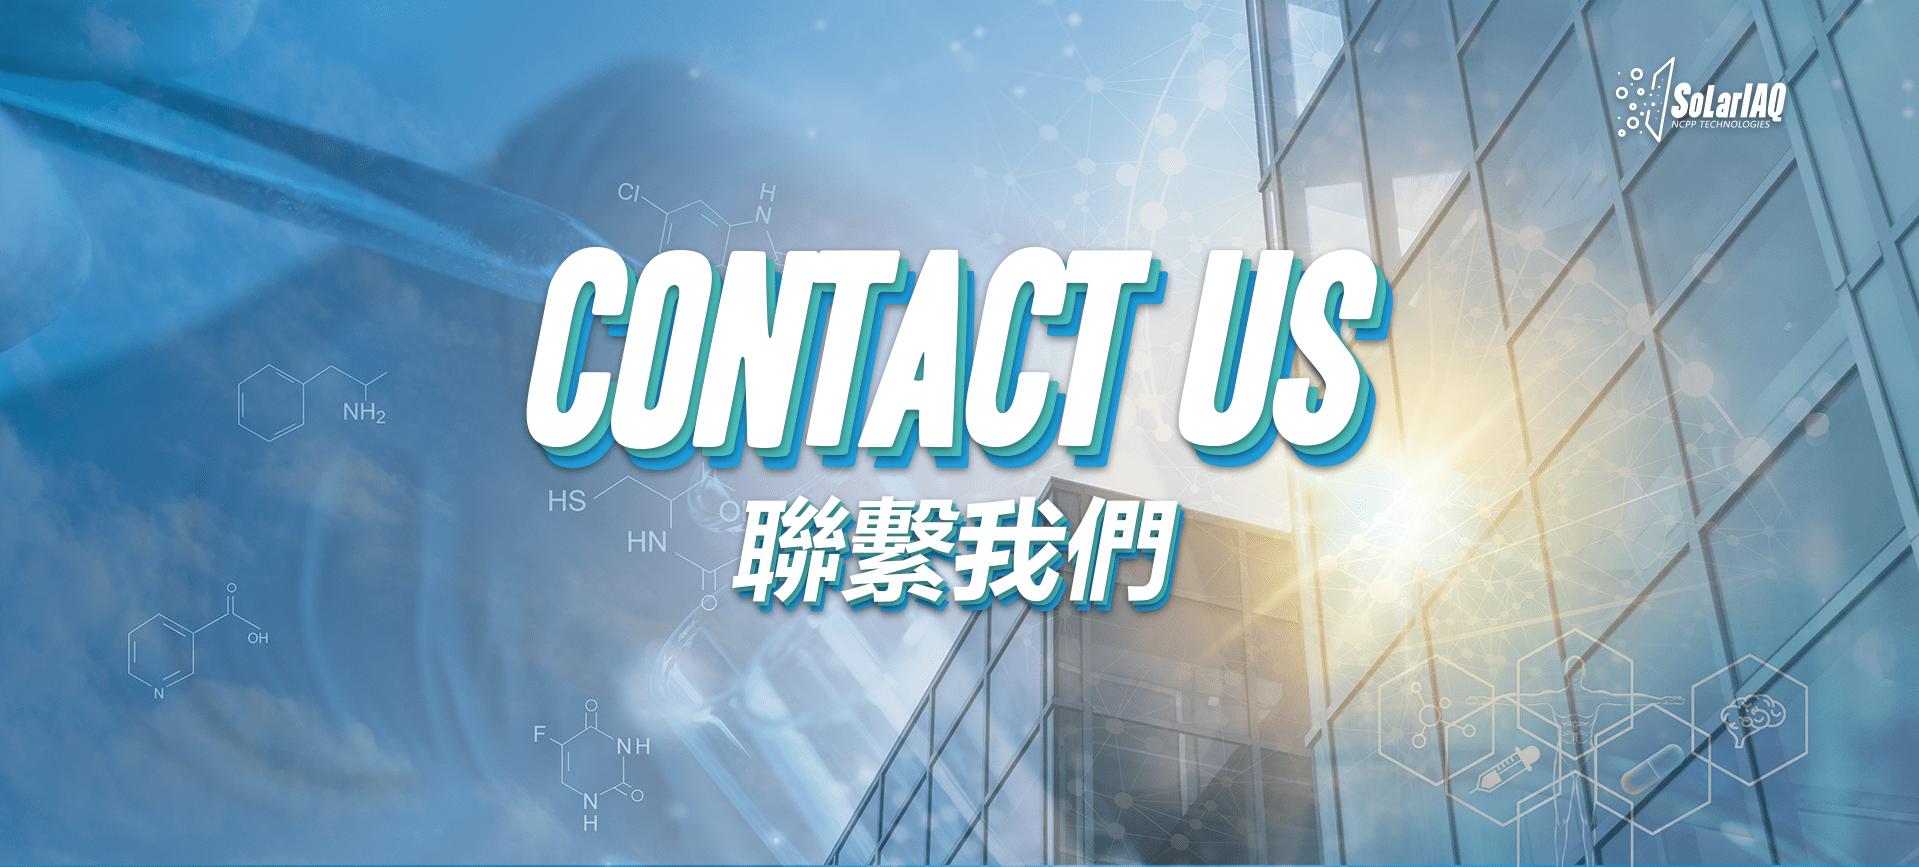 SolarIAQ - Contact Us